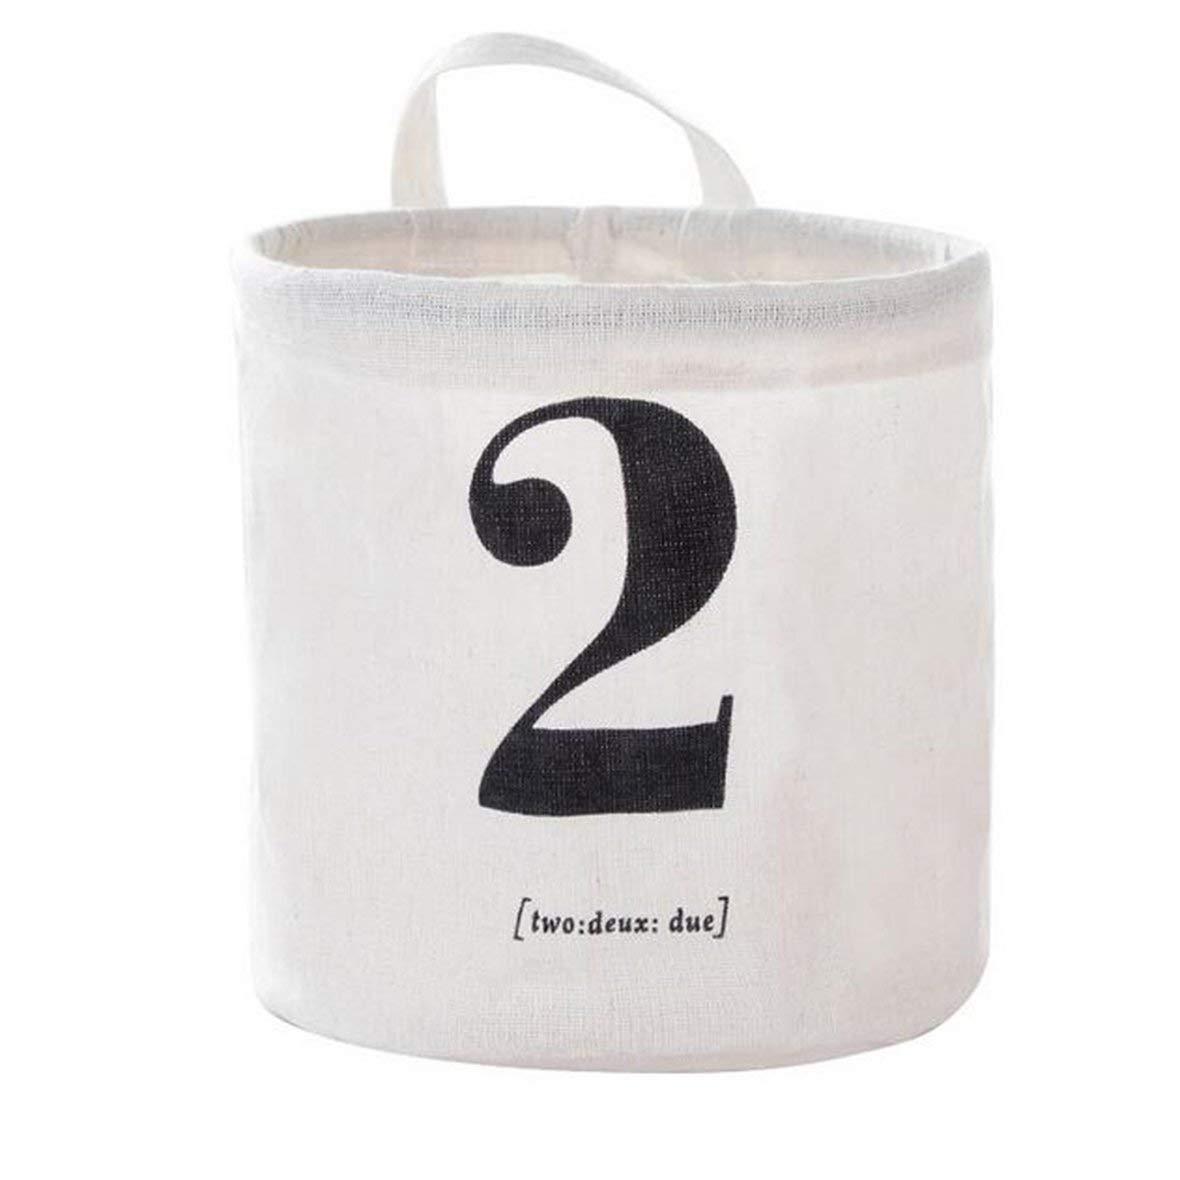 Tivolii Creative Cotton Linen Storage Bag with Number Make up Bag Household Storage Basket PE Coating Waterproof Storage Organizer Household Storage Basket